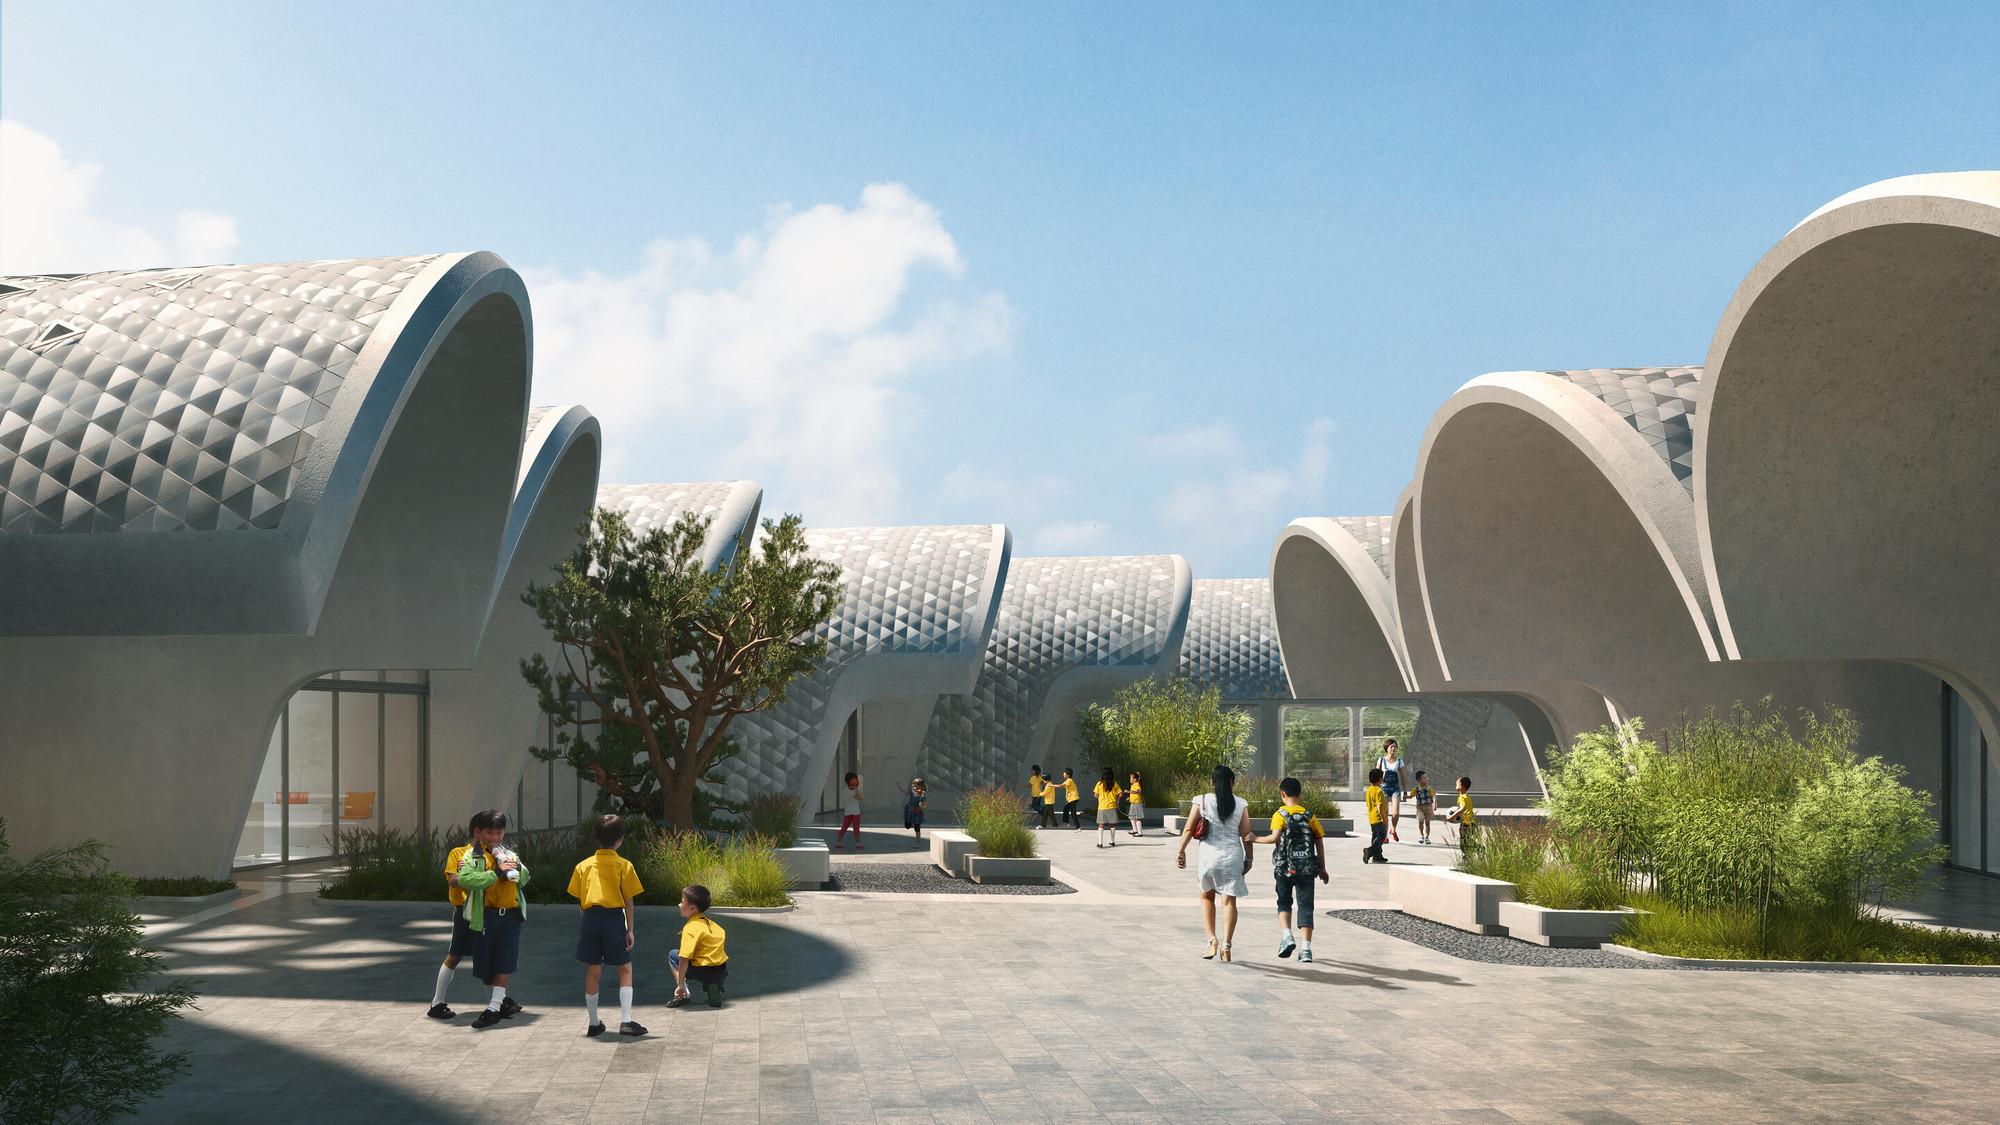 Zaha Hadid Architects Designs Parabolic-Vaulted School Campus in Rural China